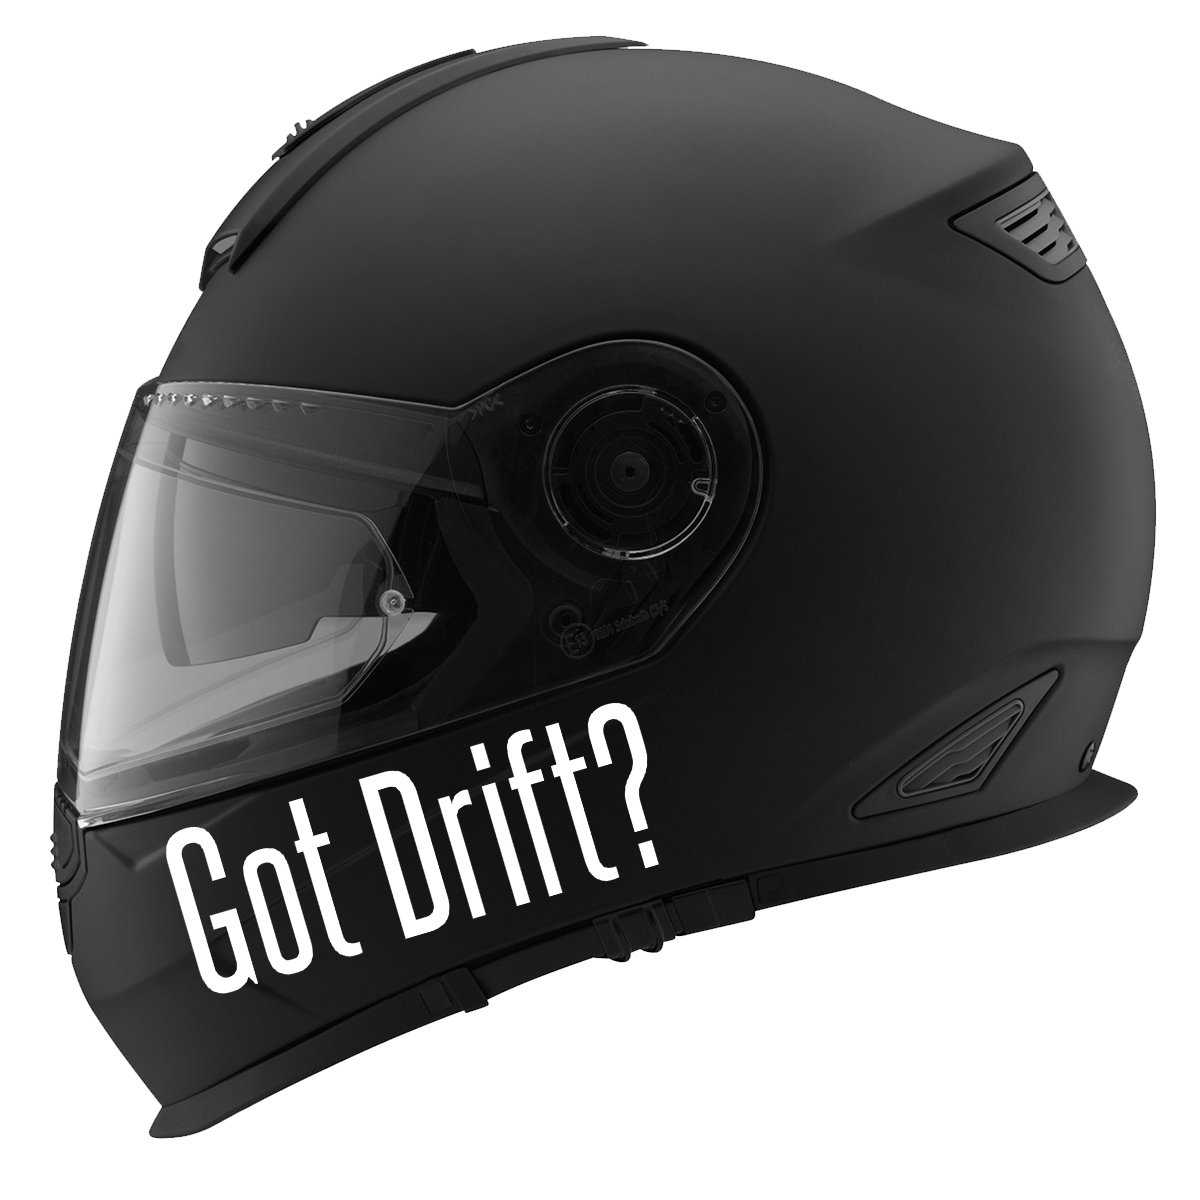 Got Drift 5 White Decal Serpent Auto Car Racing Motorcycle Helmet Decal